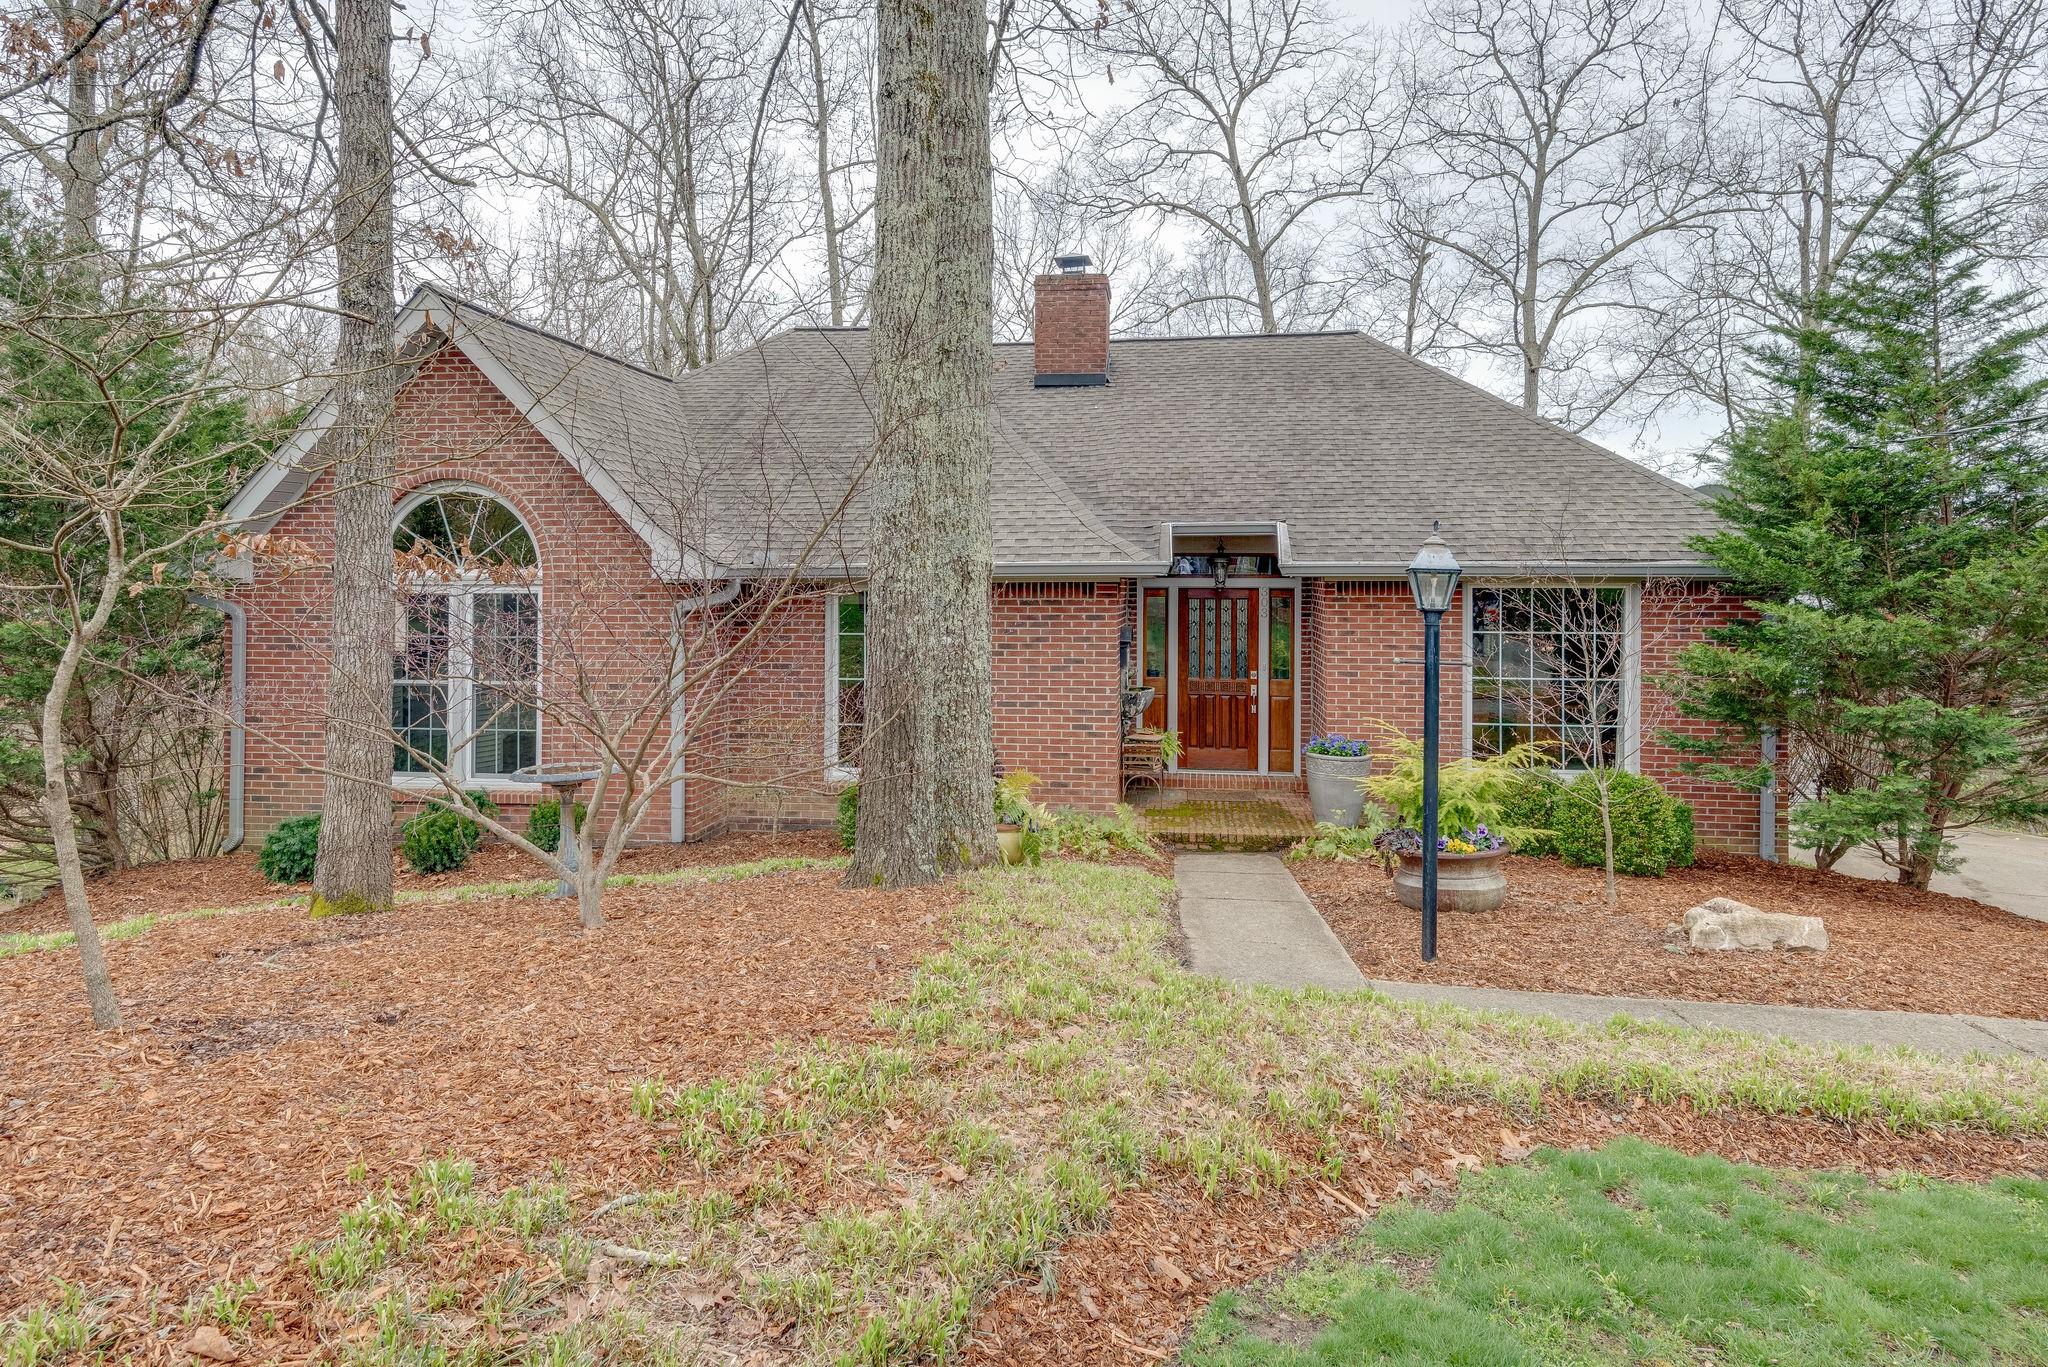 303 Woodlands Dr, Kingston Springs, TN 37082 - Kingston Springs, TN real estate listing